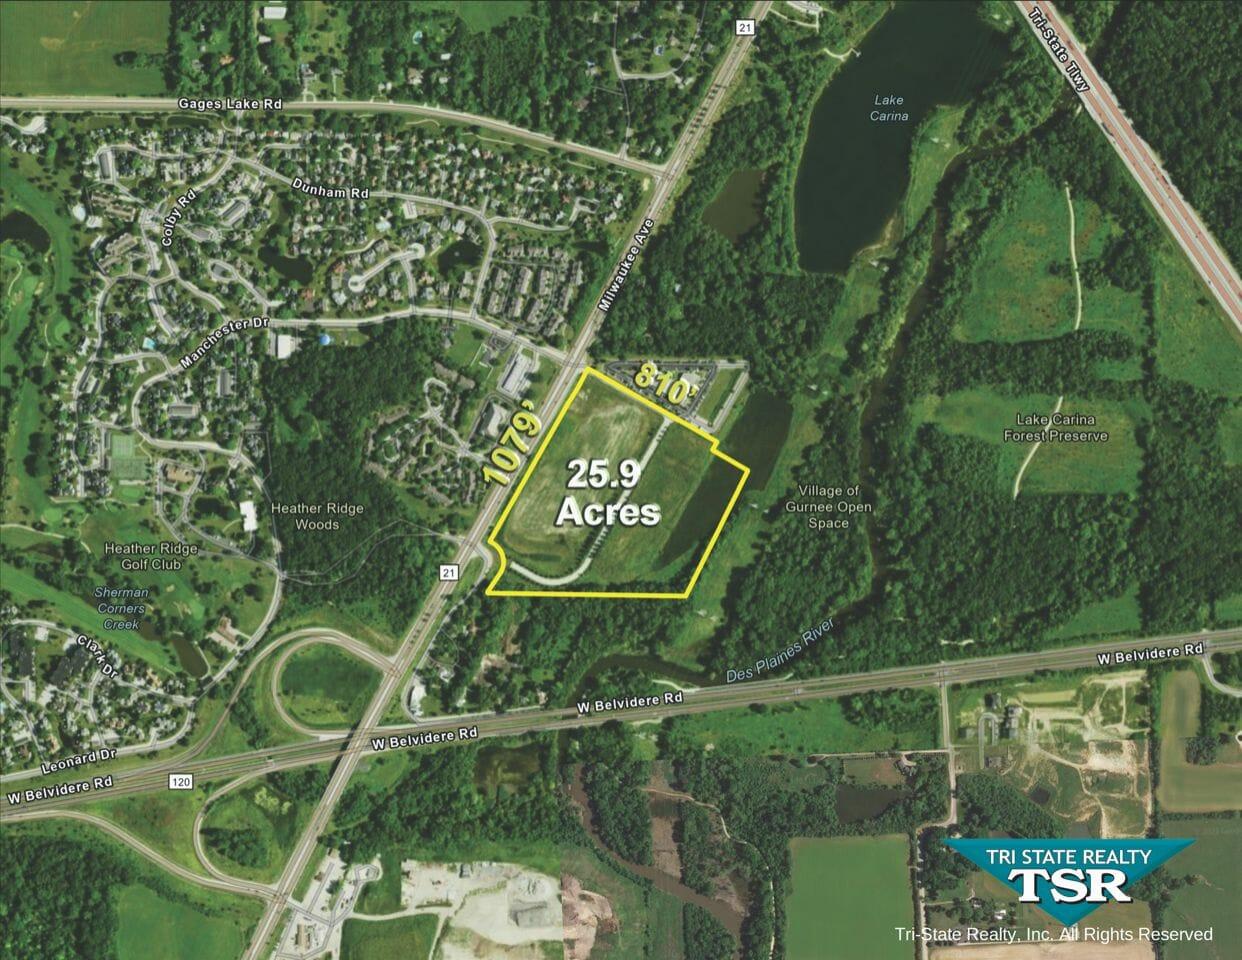 25.9 Acres Commercial Site North IL Route 21 Gurnee IL